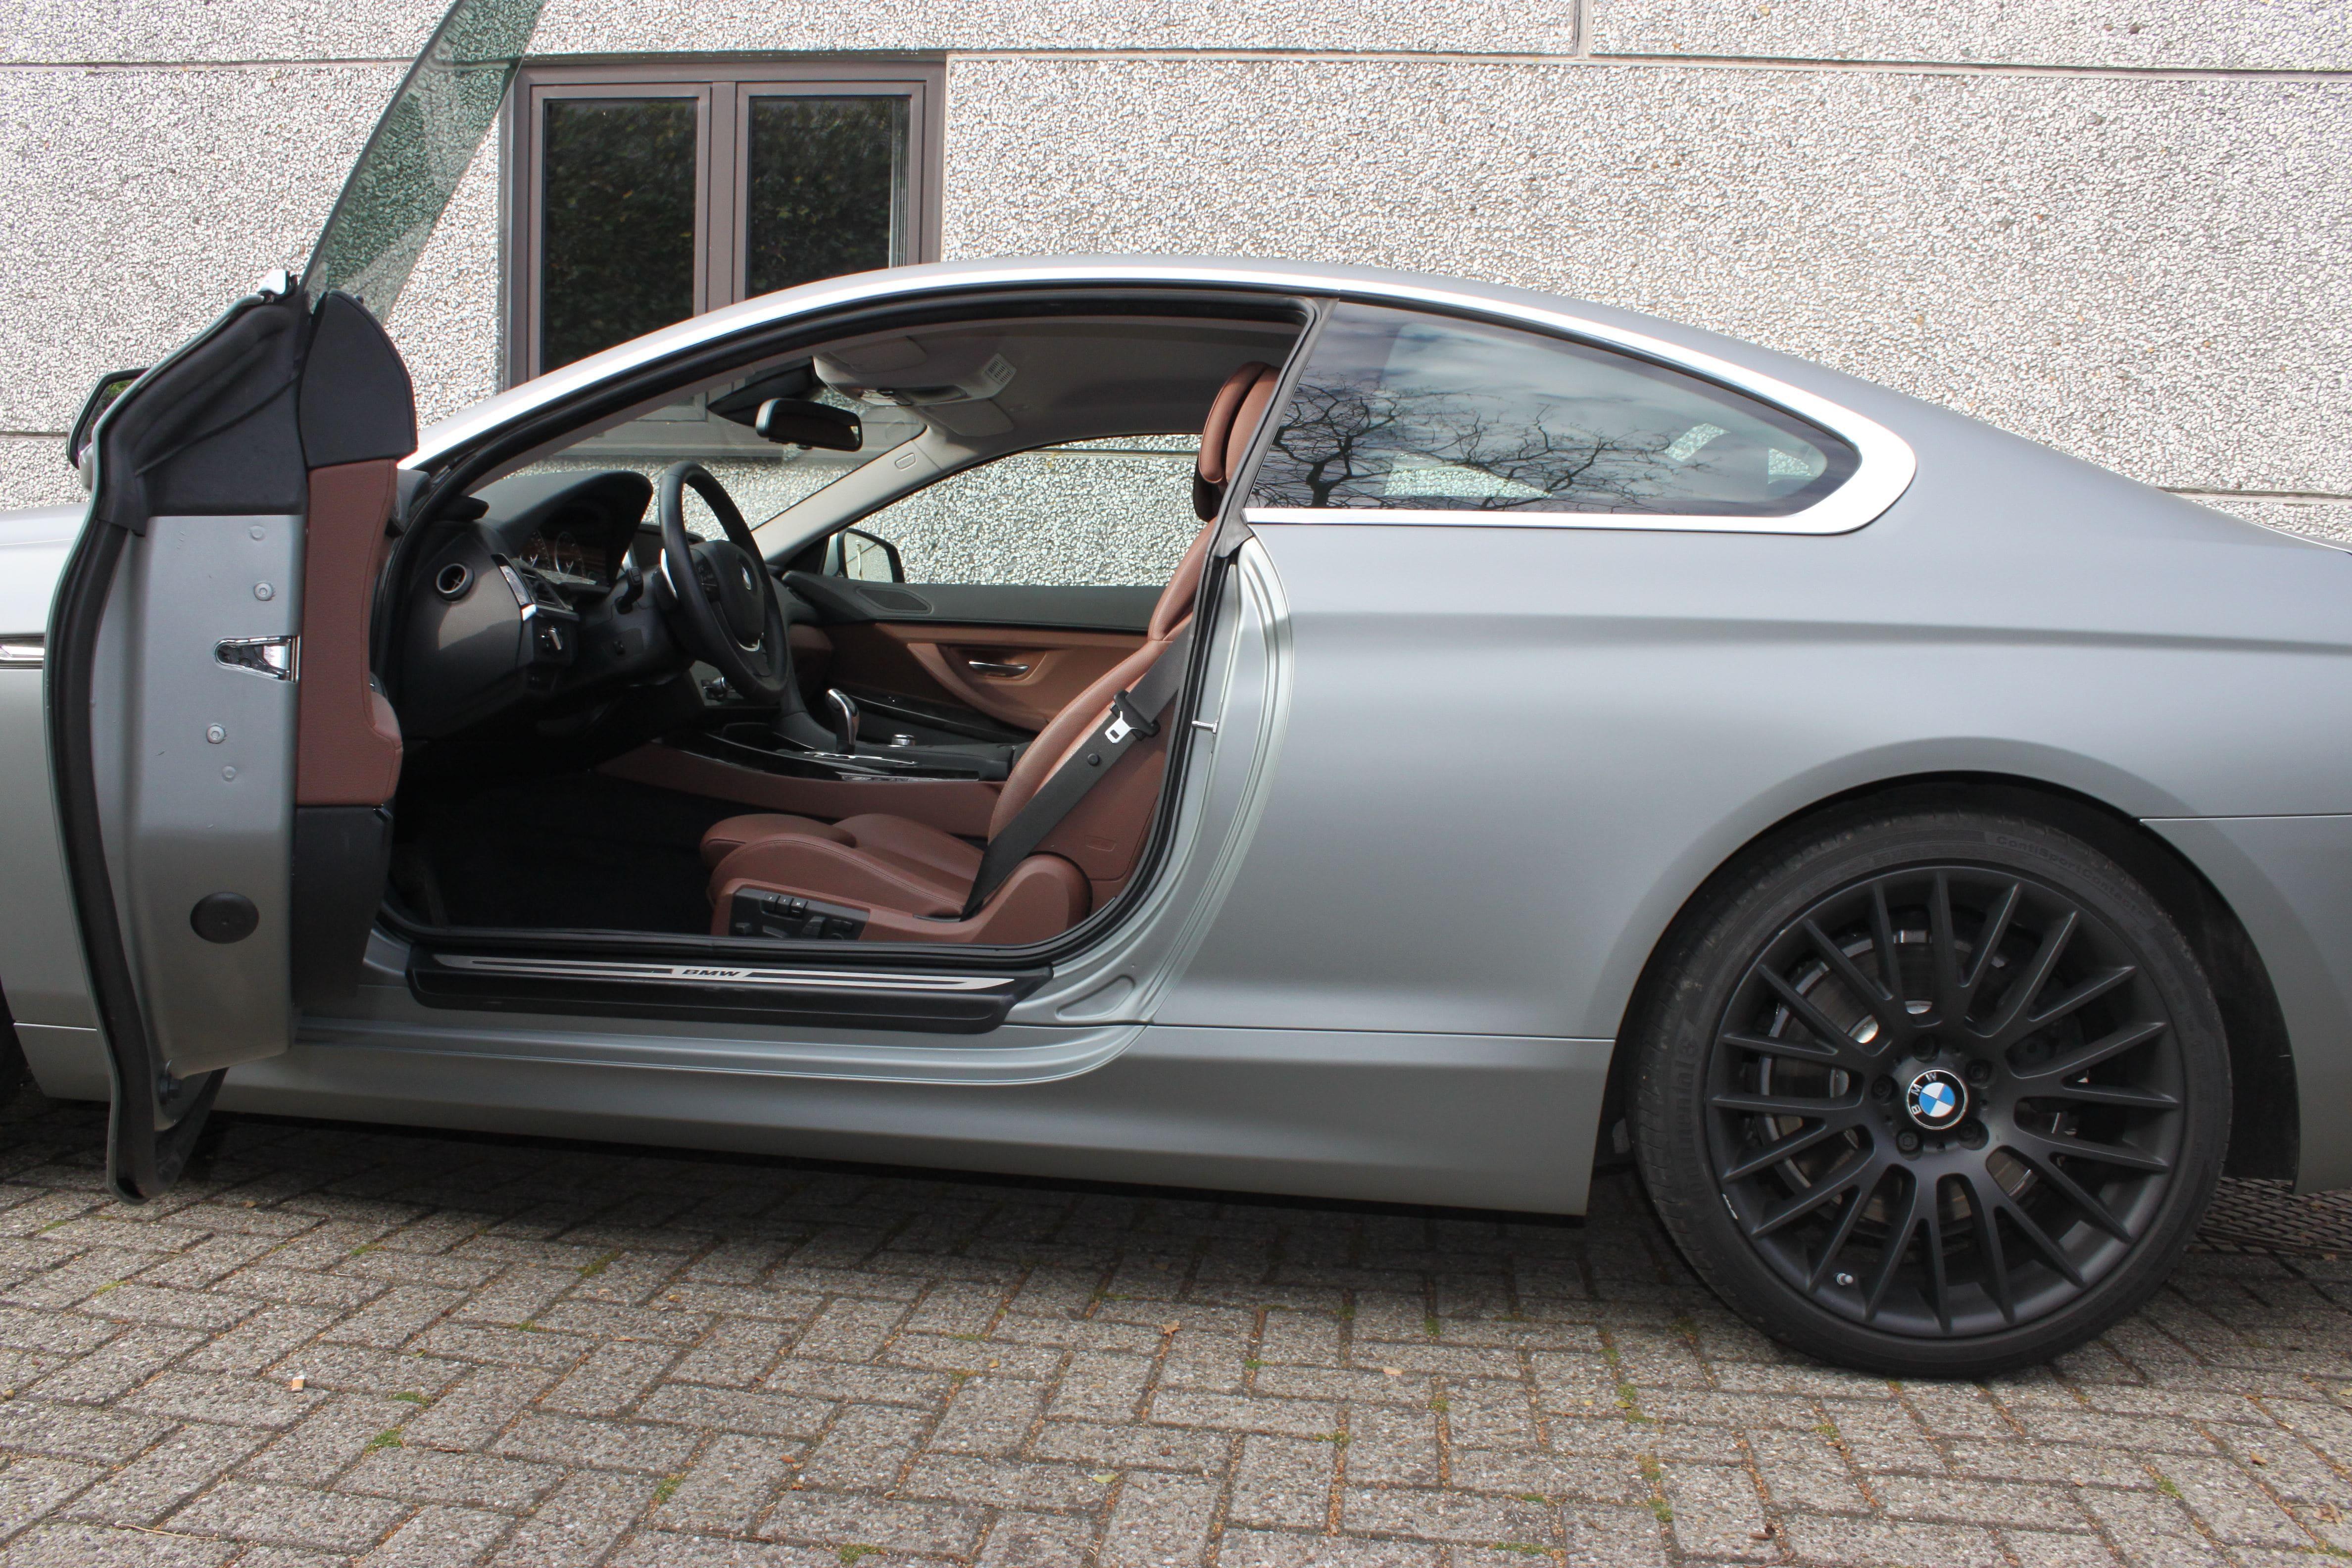 BMW 650i met Mat Antraciet Metallic Avery Wrap, Carwrapping door Wrapmyride.nu Foto-nr:5279, ©2020